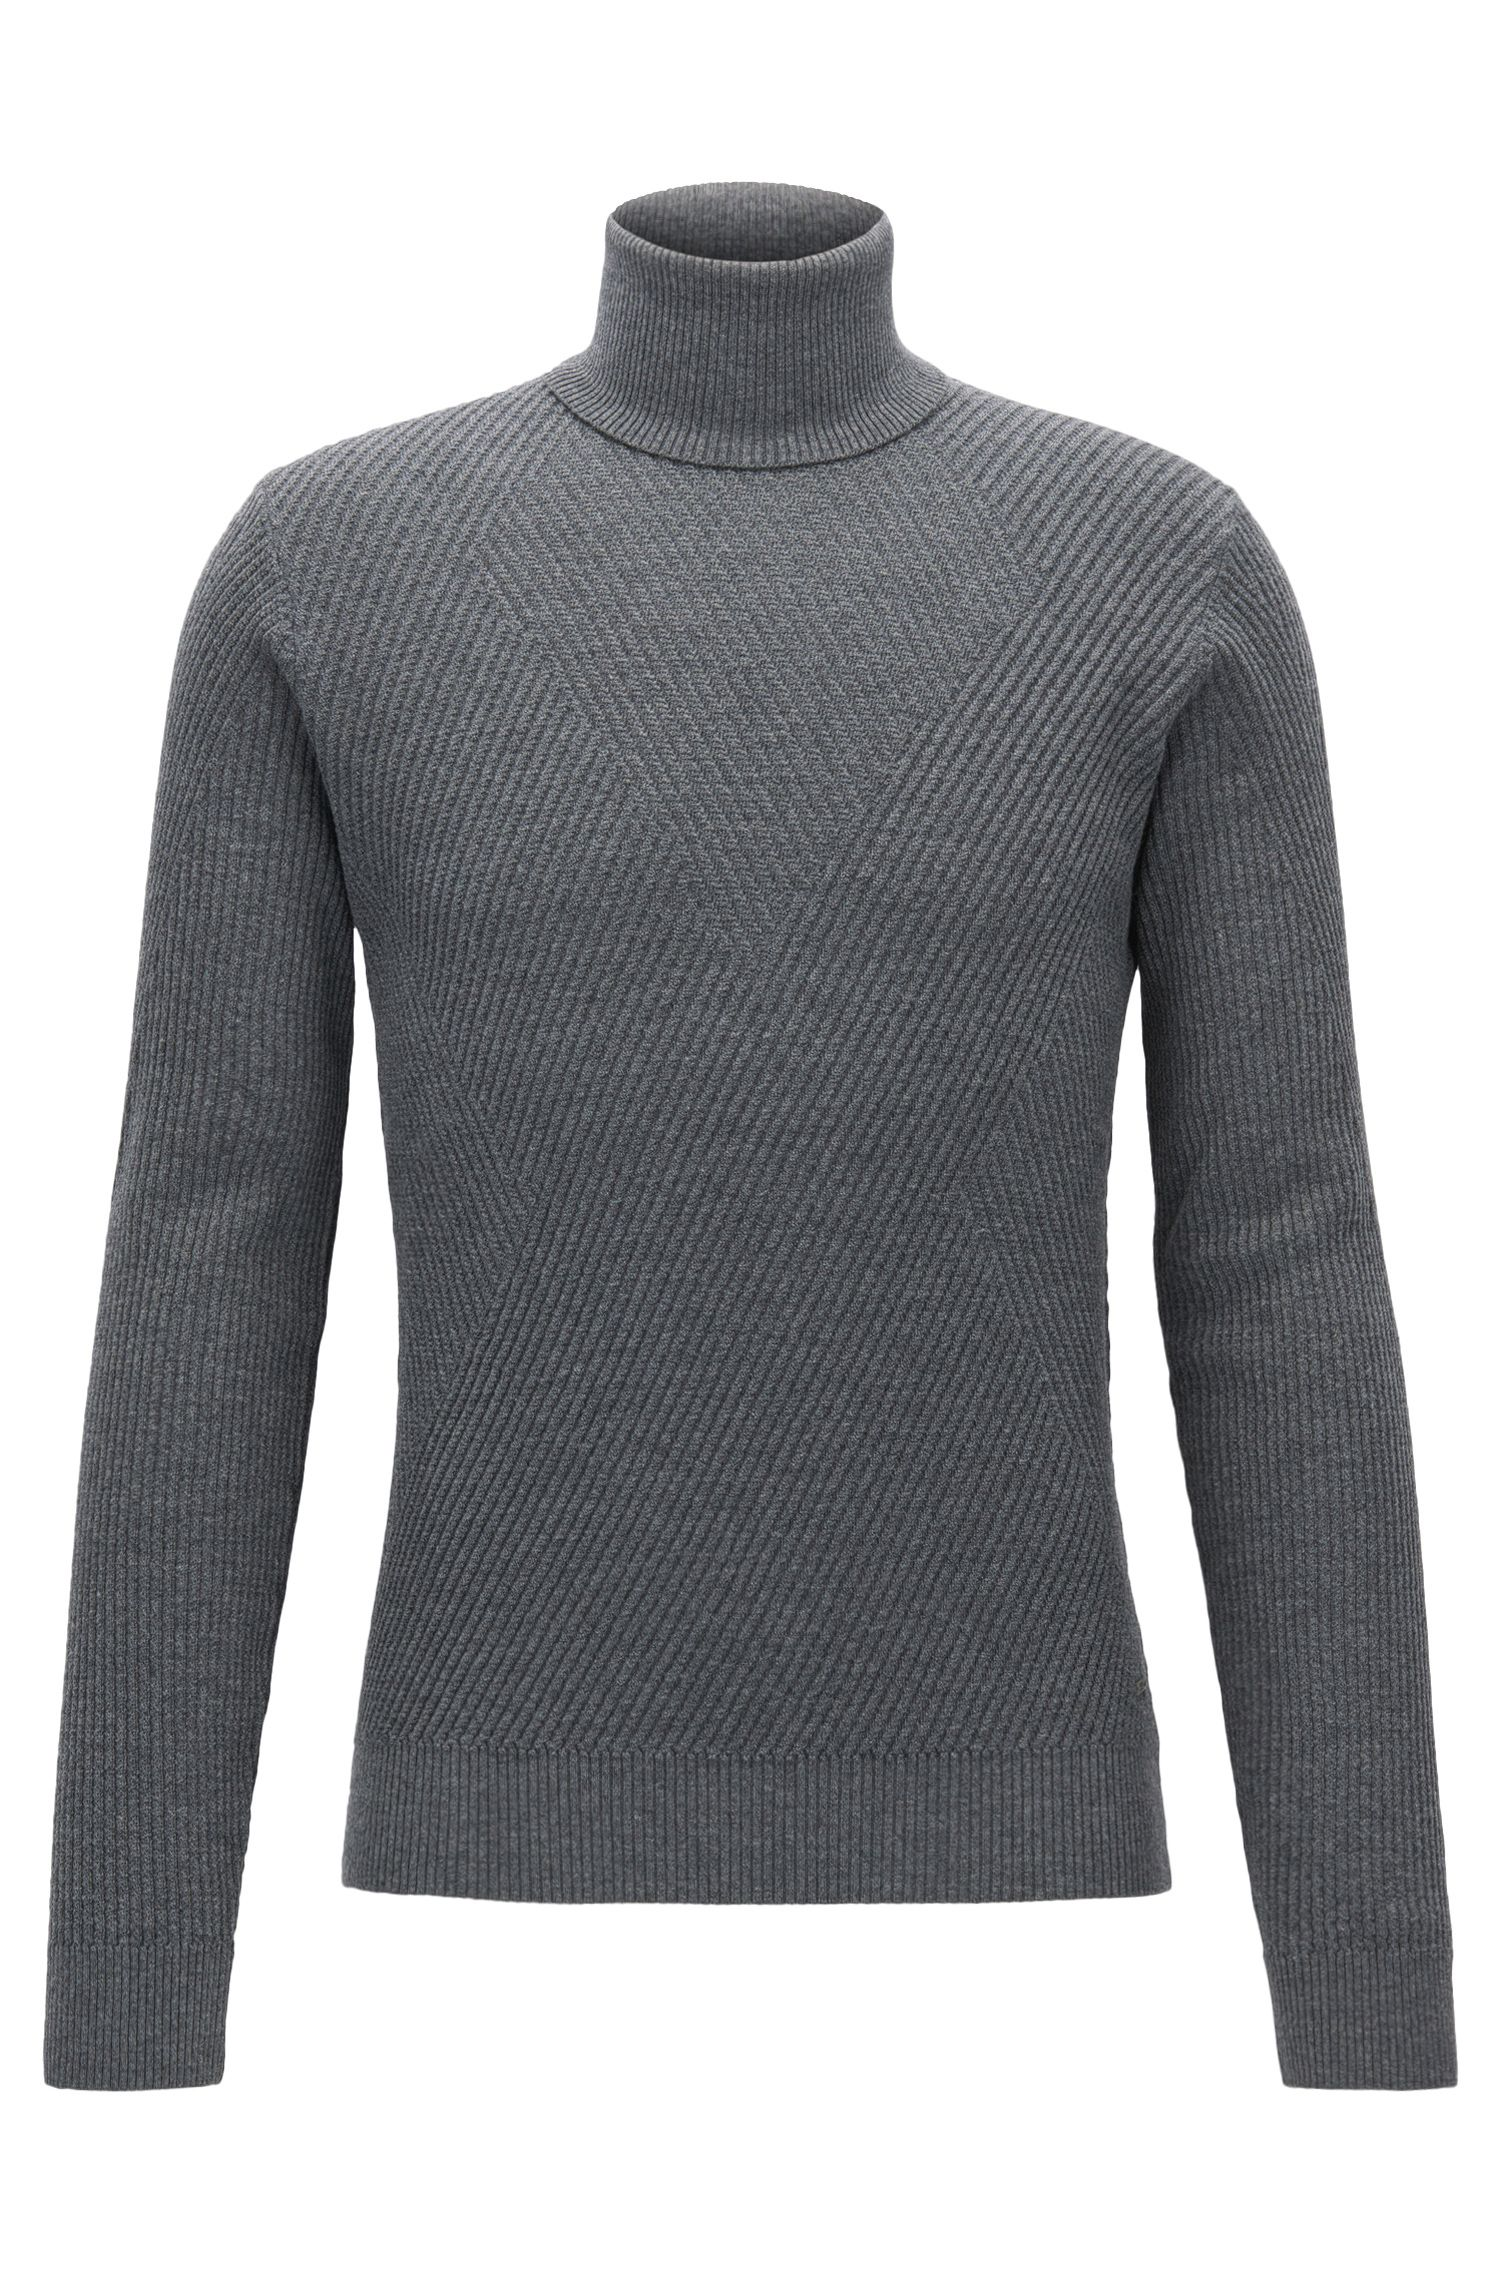 Ribbed Virgin Wool Sweater   Nazzaro